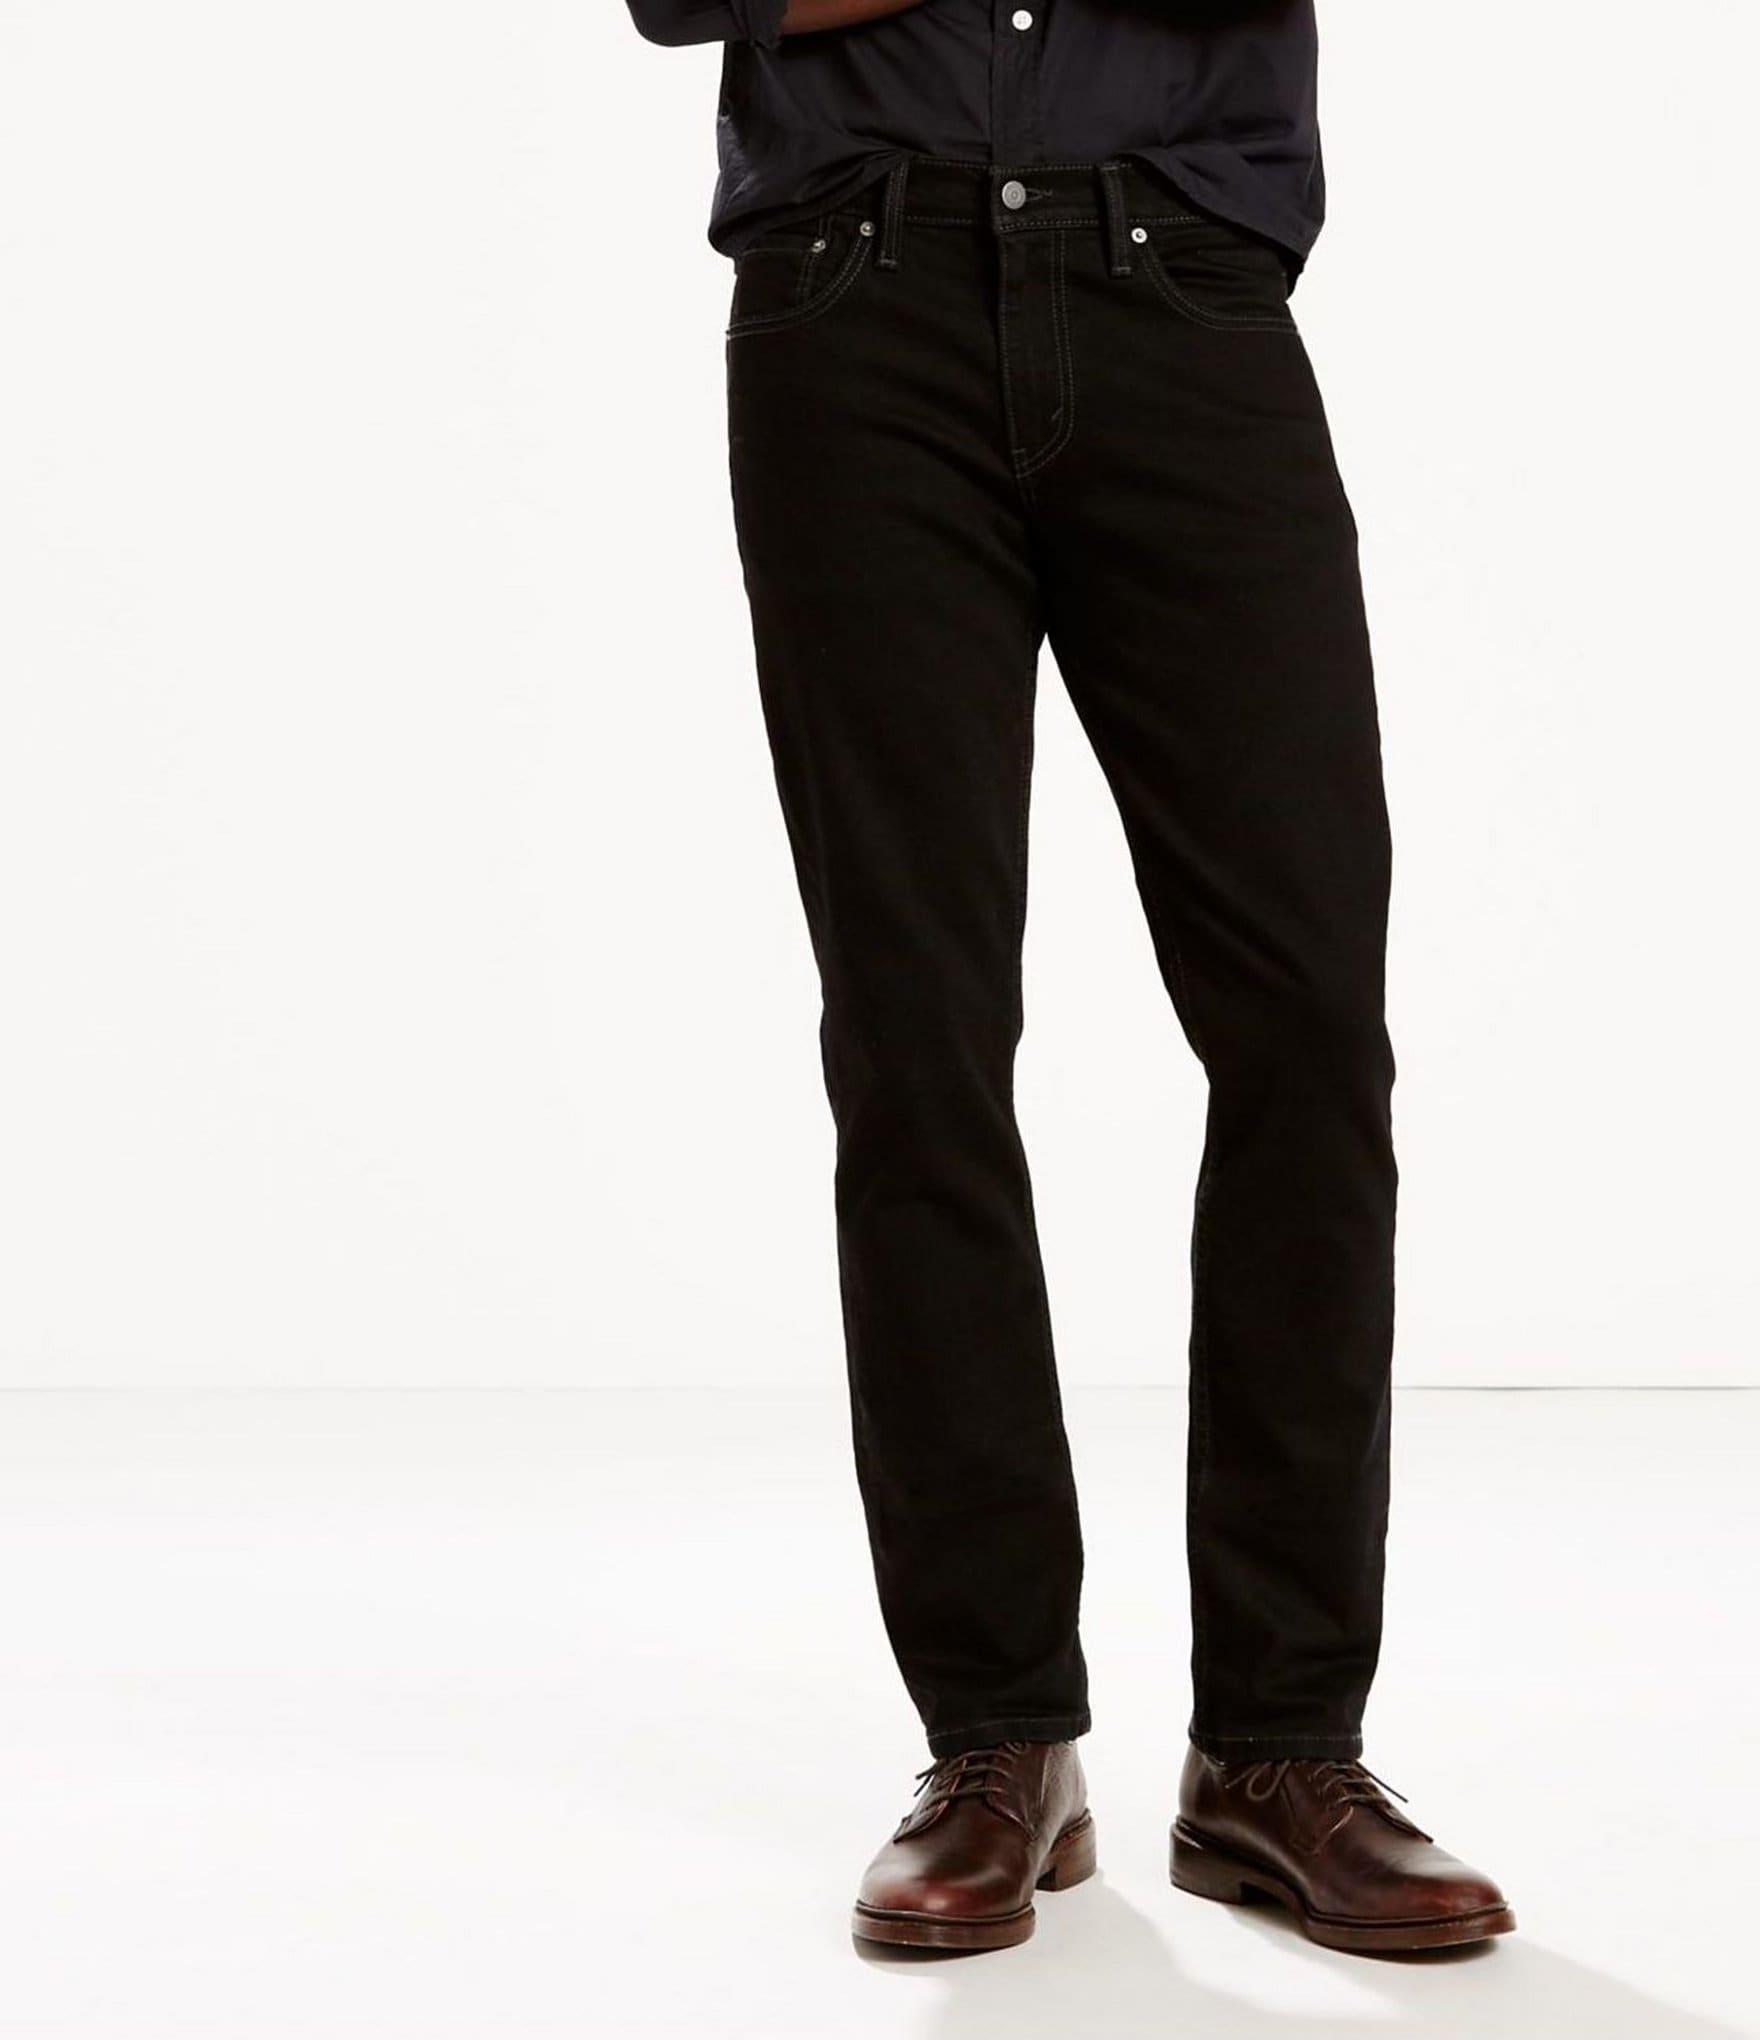 levi 39 s 511 slim fit advanced stretch jeans dillards. Black Bedroom Furniture Sets. Home Design Ideas